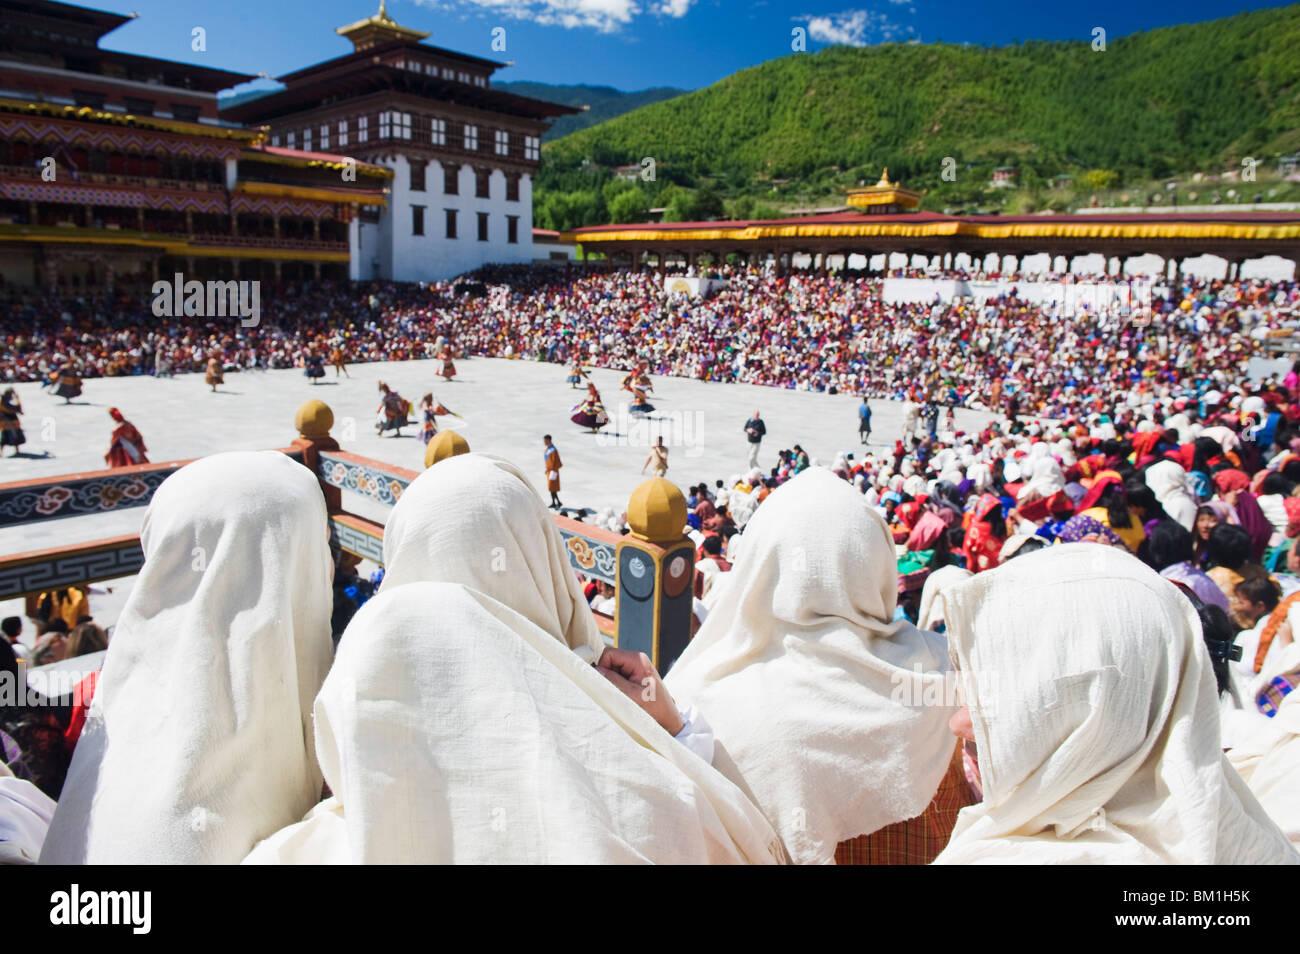 Spectateurs regardant l'automne Tsechu (festival) à Trashi Chhoe Dzong, Thimphu, Bhoutan, Asie Photo Stock